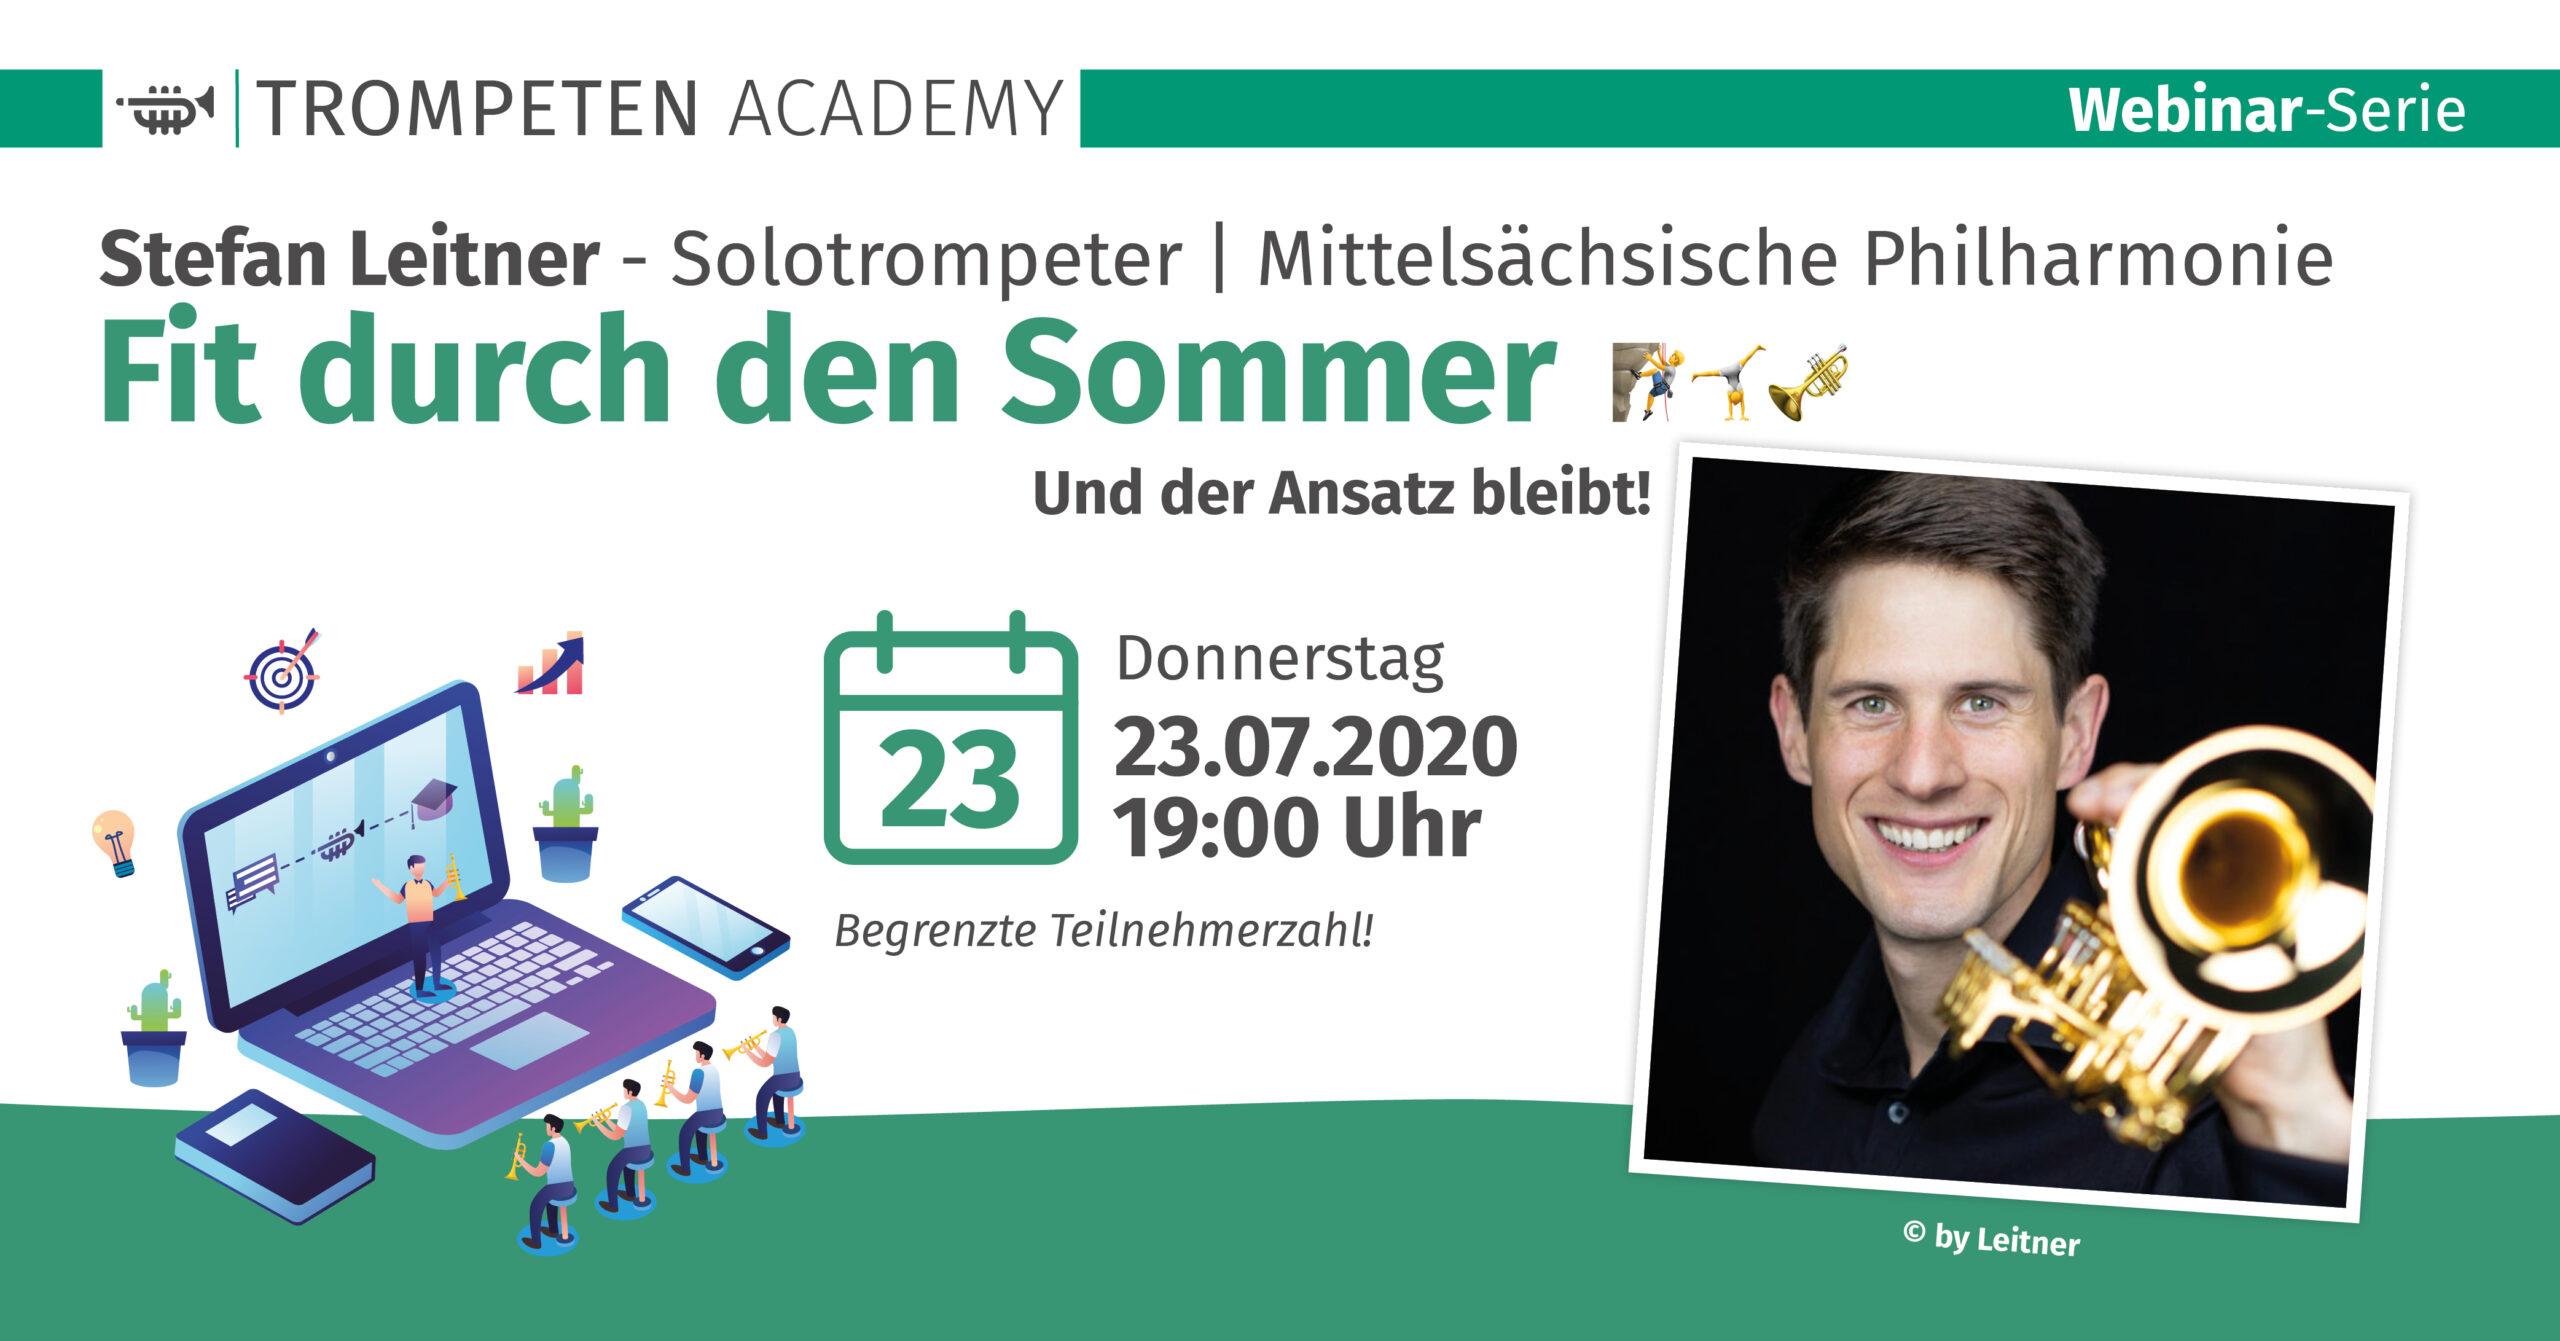 https://www.trompeten.academy/produkt/fit-durch-den-sommer-stefan-leitner/